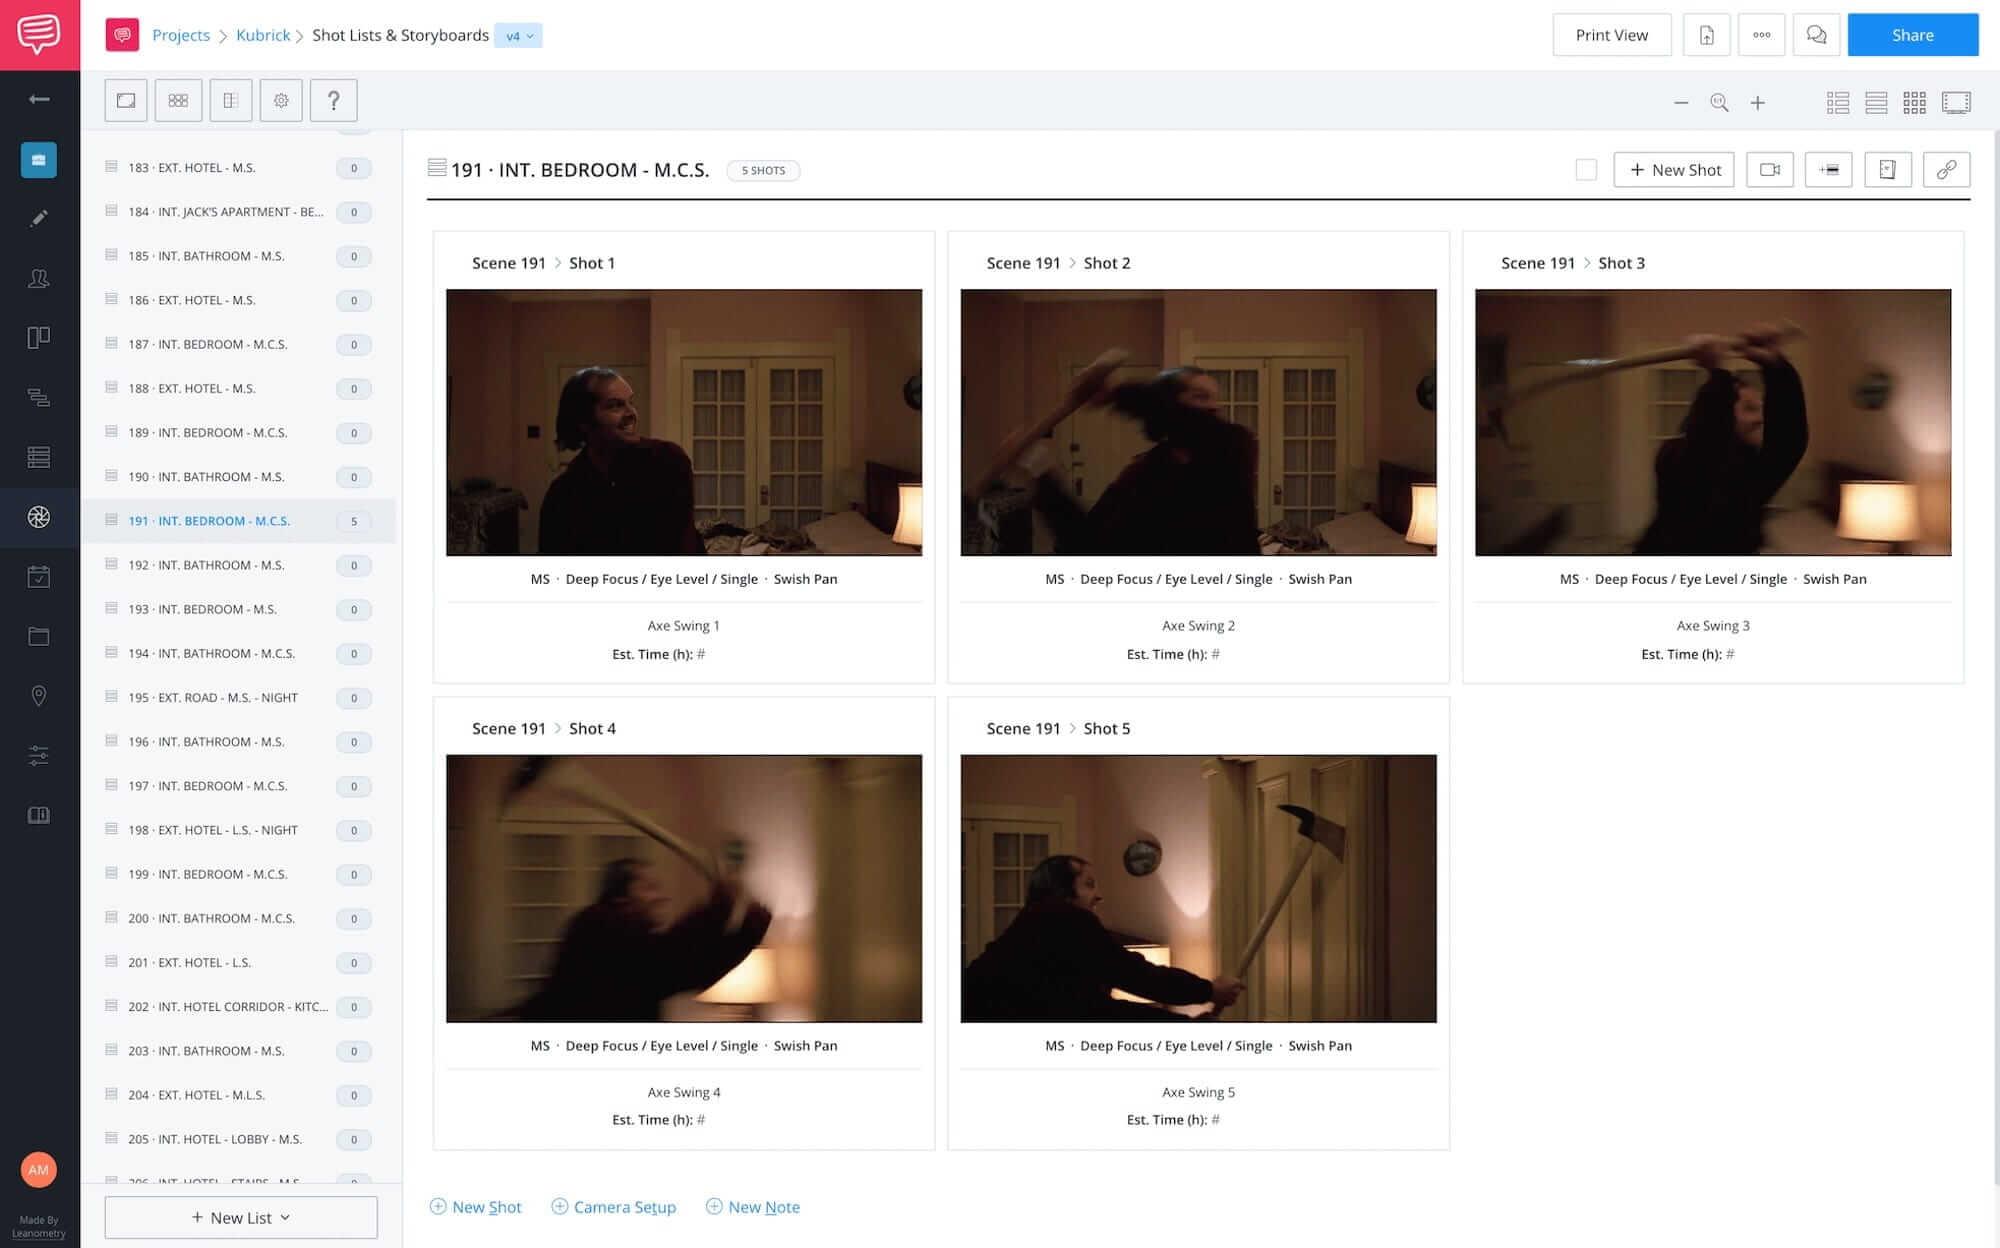 Best Stanley Kubrick Movies - The Shining - StudioBinder Online Shot List Software